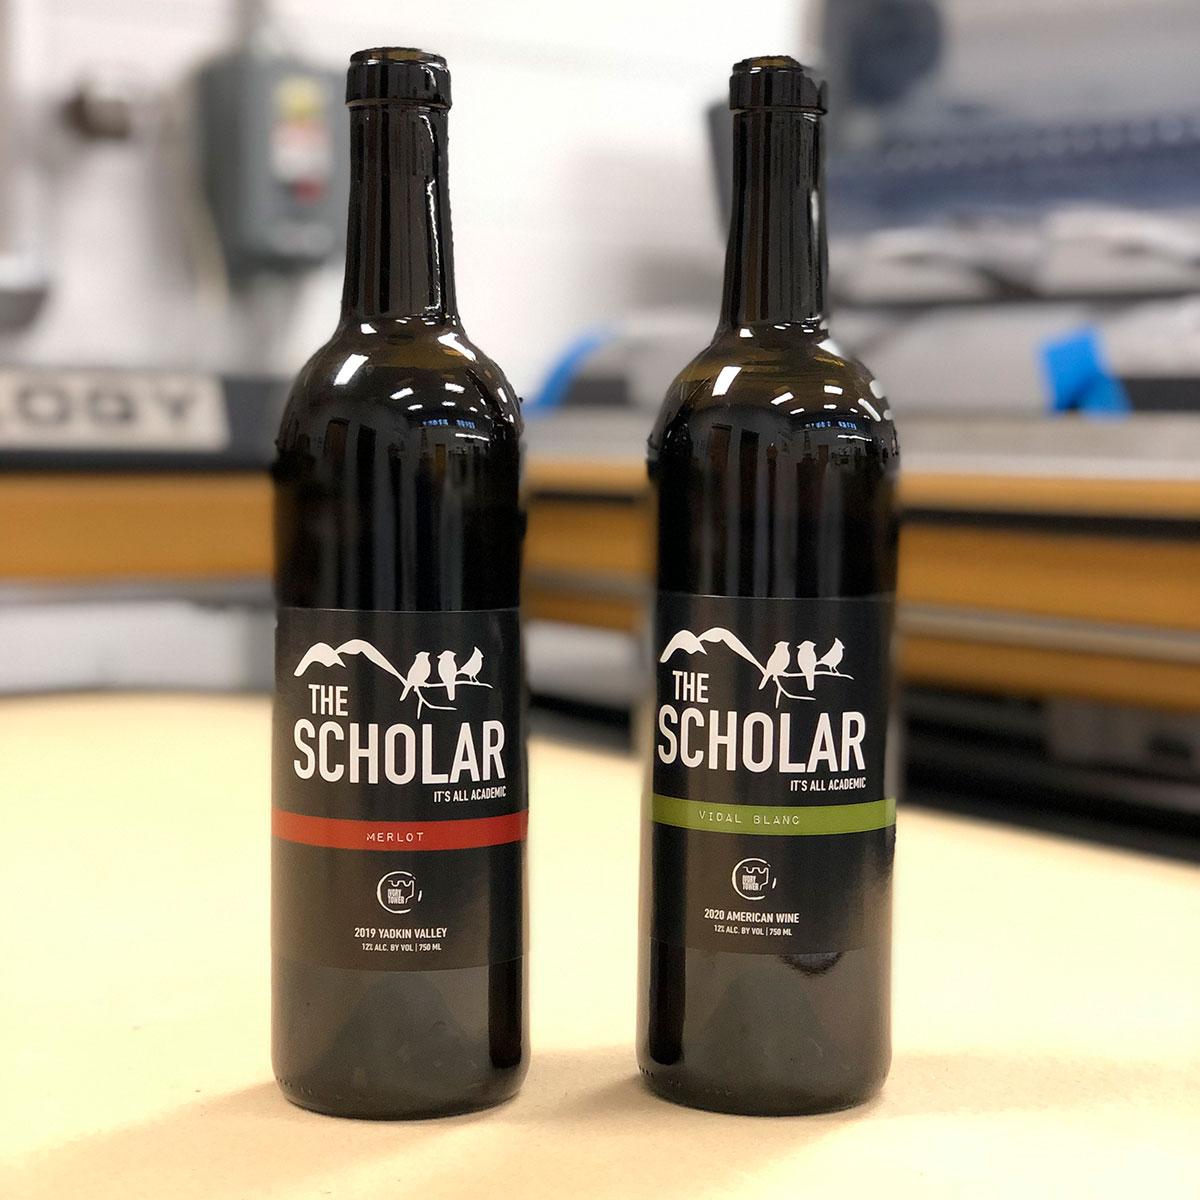 The Scholar: Merlot and Vidal Blanc product labels